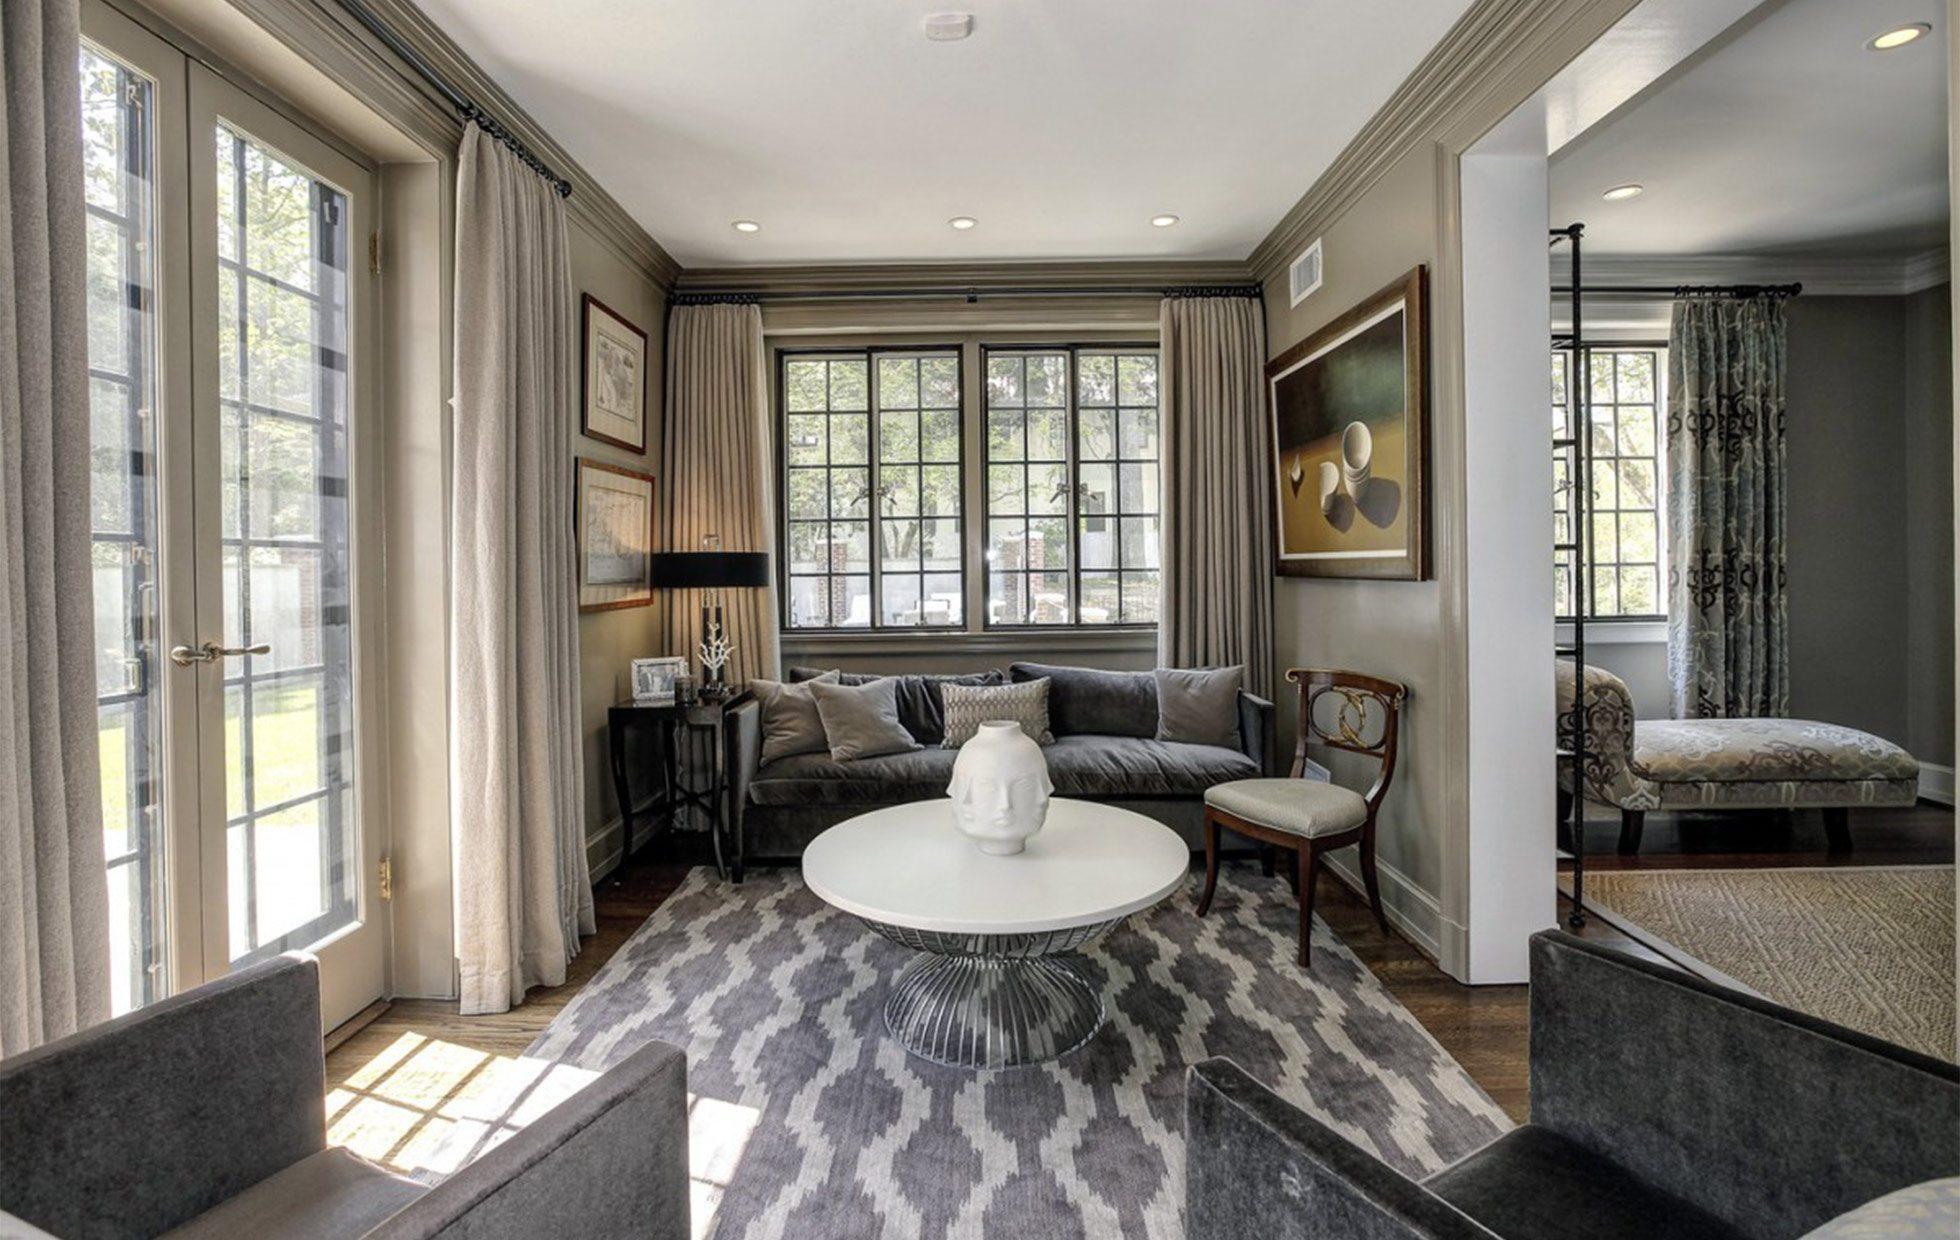 5881fec4796562446-Belmont-Road-NW-Washington-DC-Obamas-New-Home-Sitting-Room-1200x800